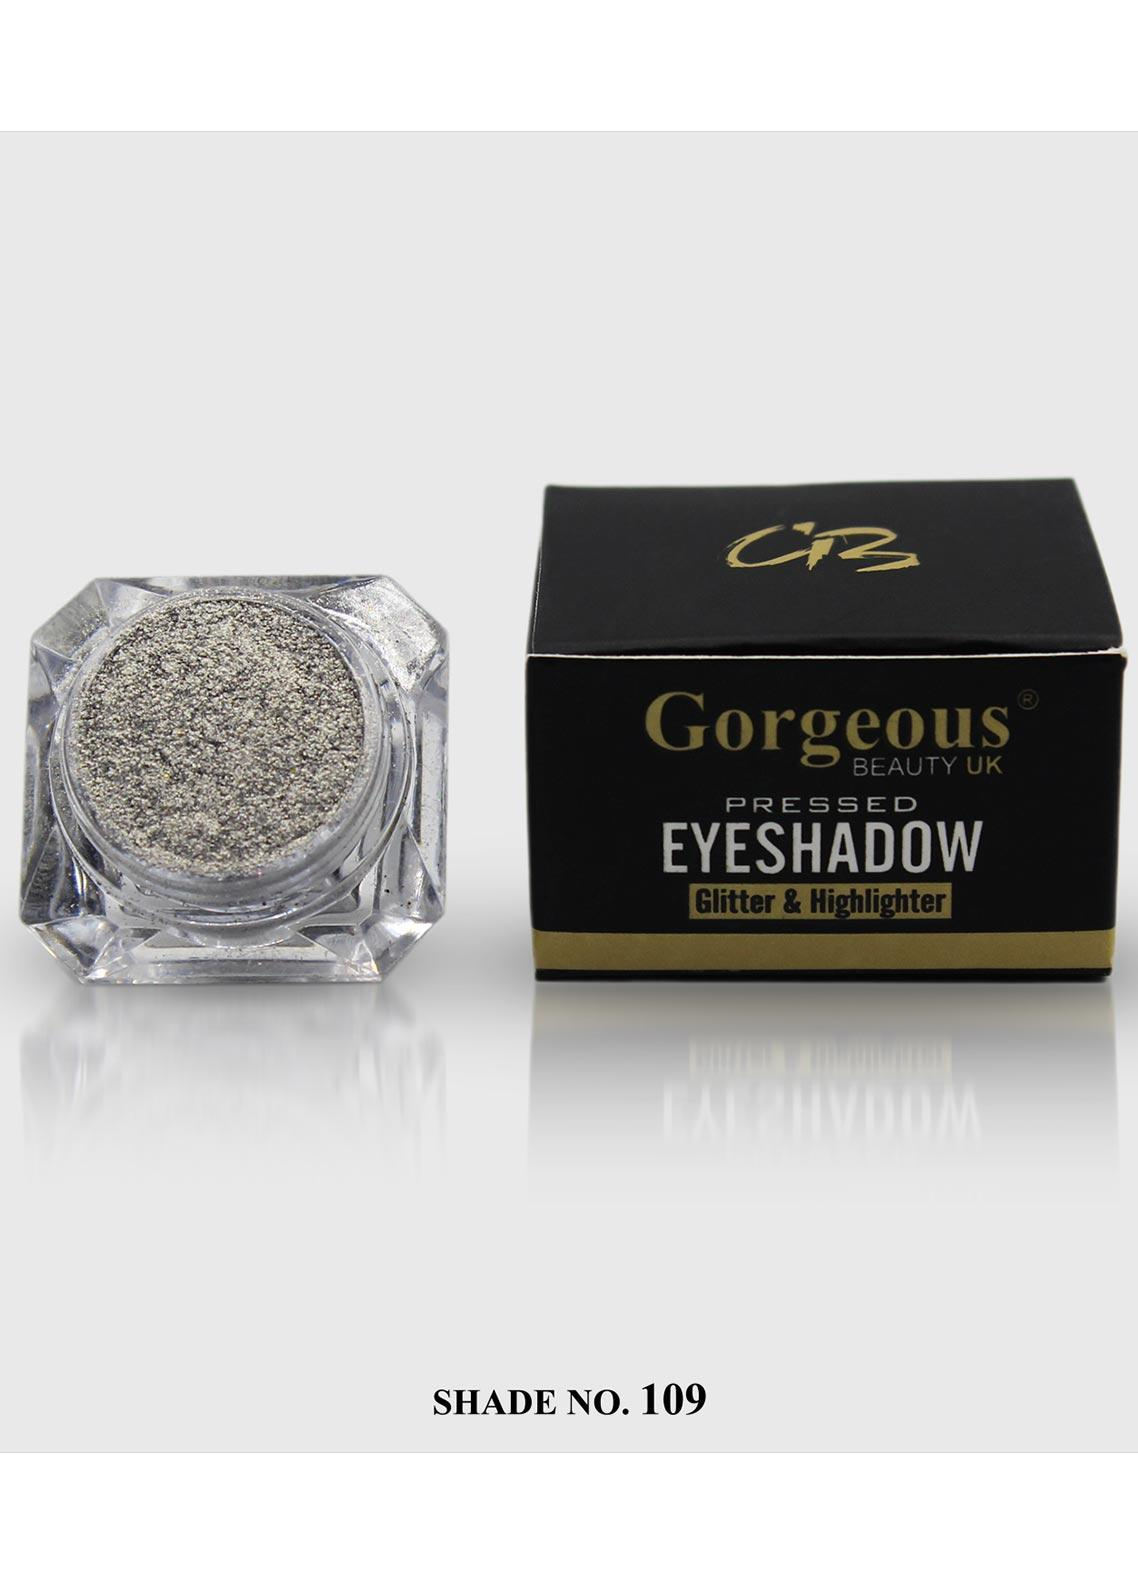 Pressed Eye Shadow Glitter & Highlighter-109